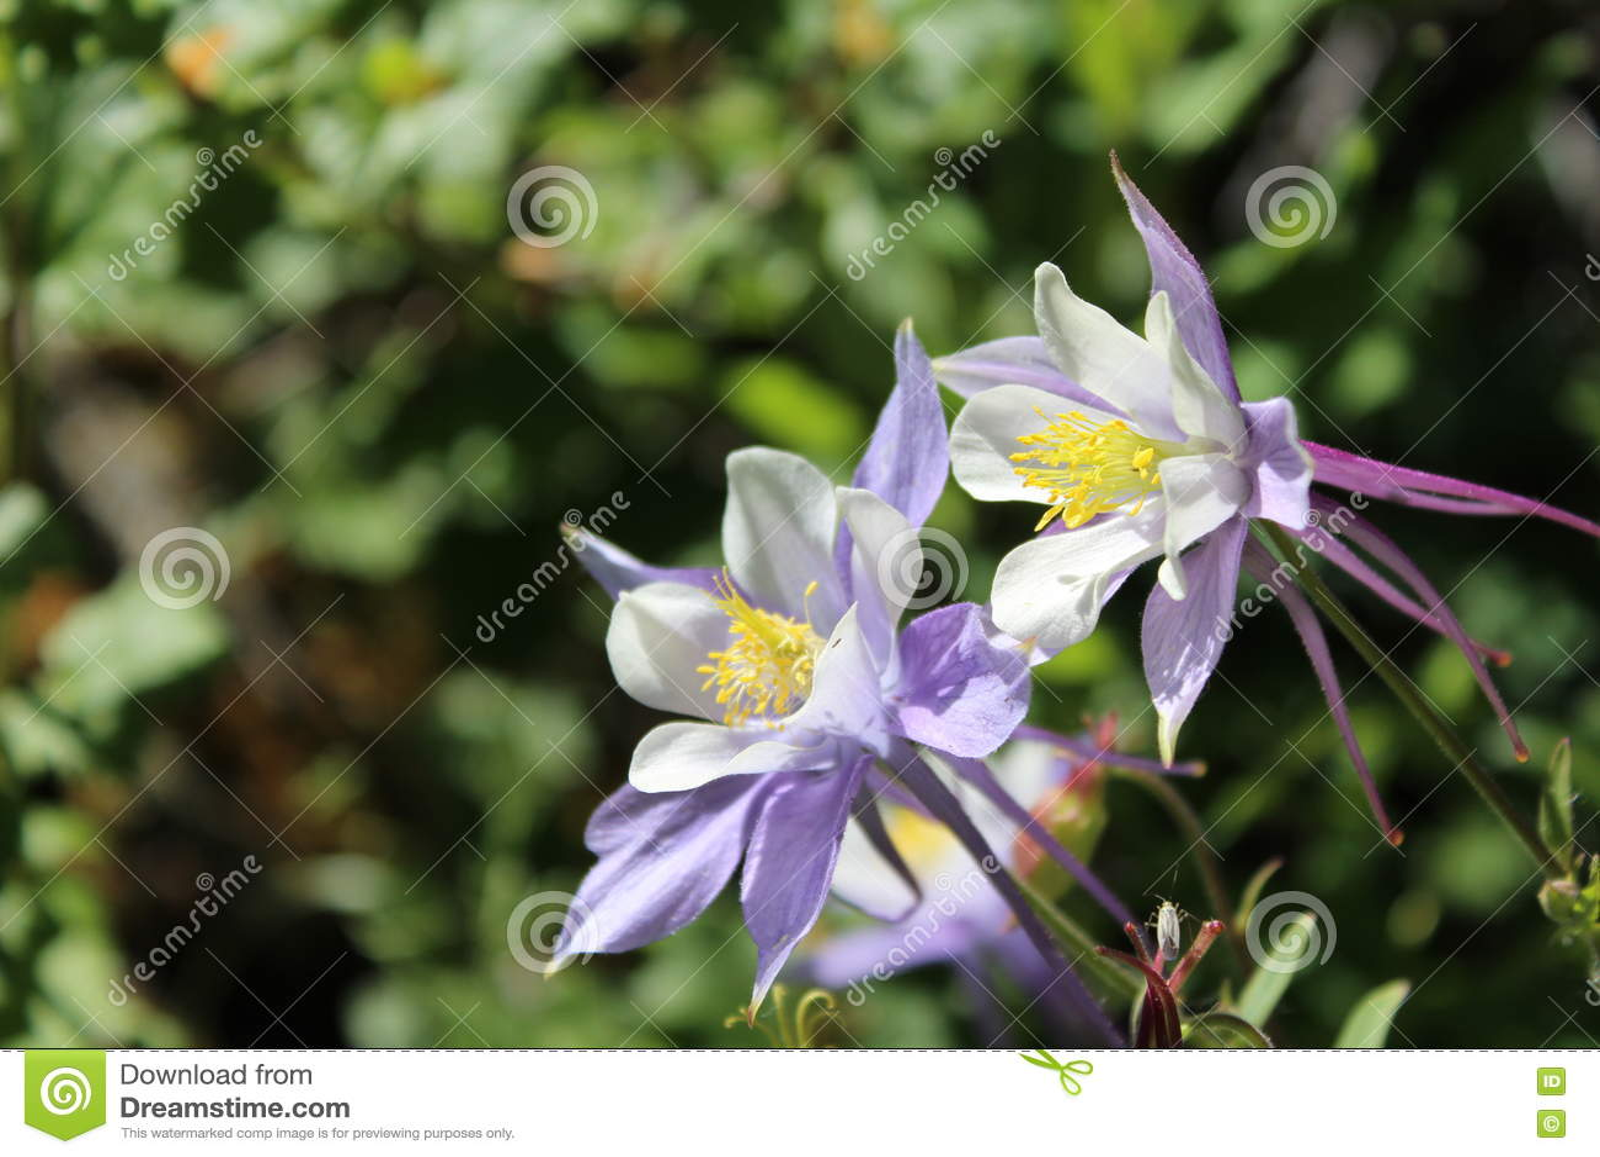 White Purple Wild Columbine Flowers Stock Image Image Of Flowers